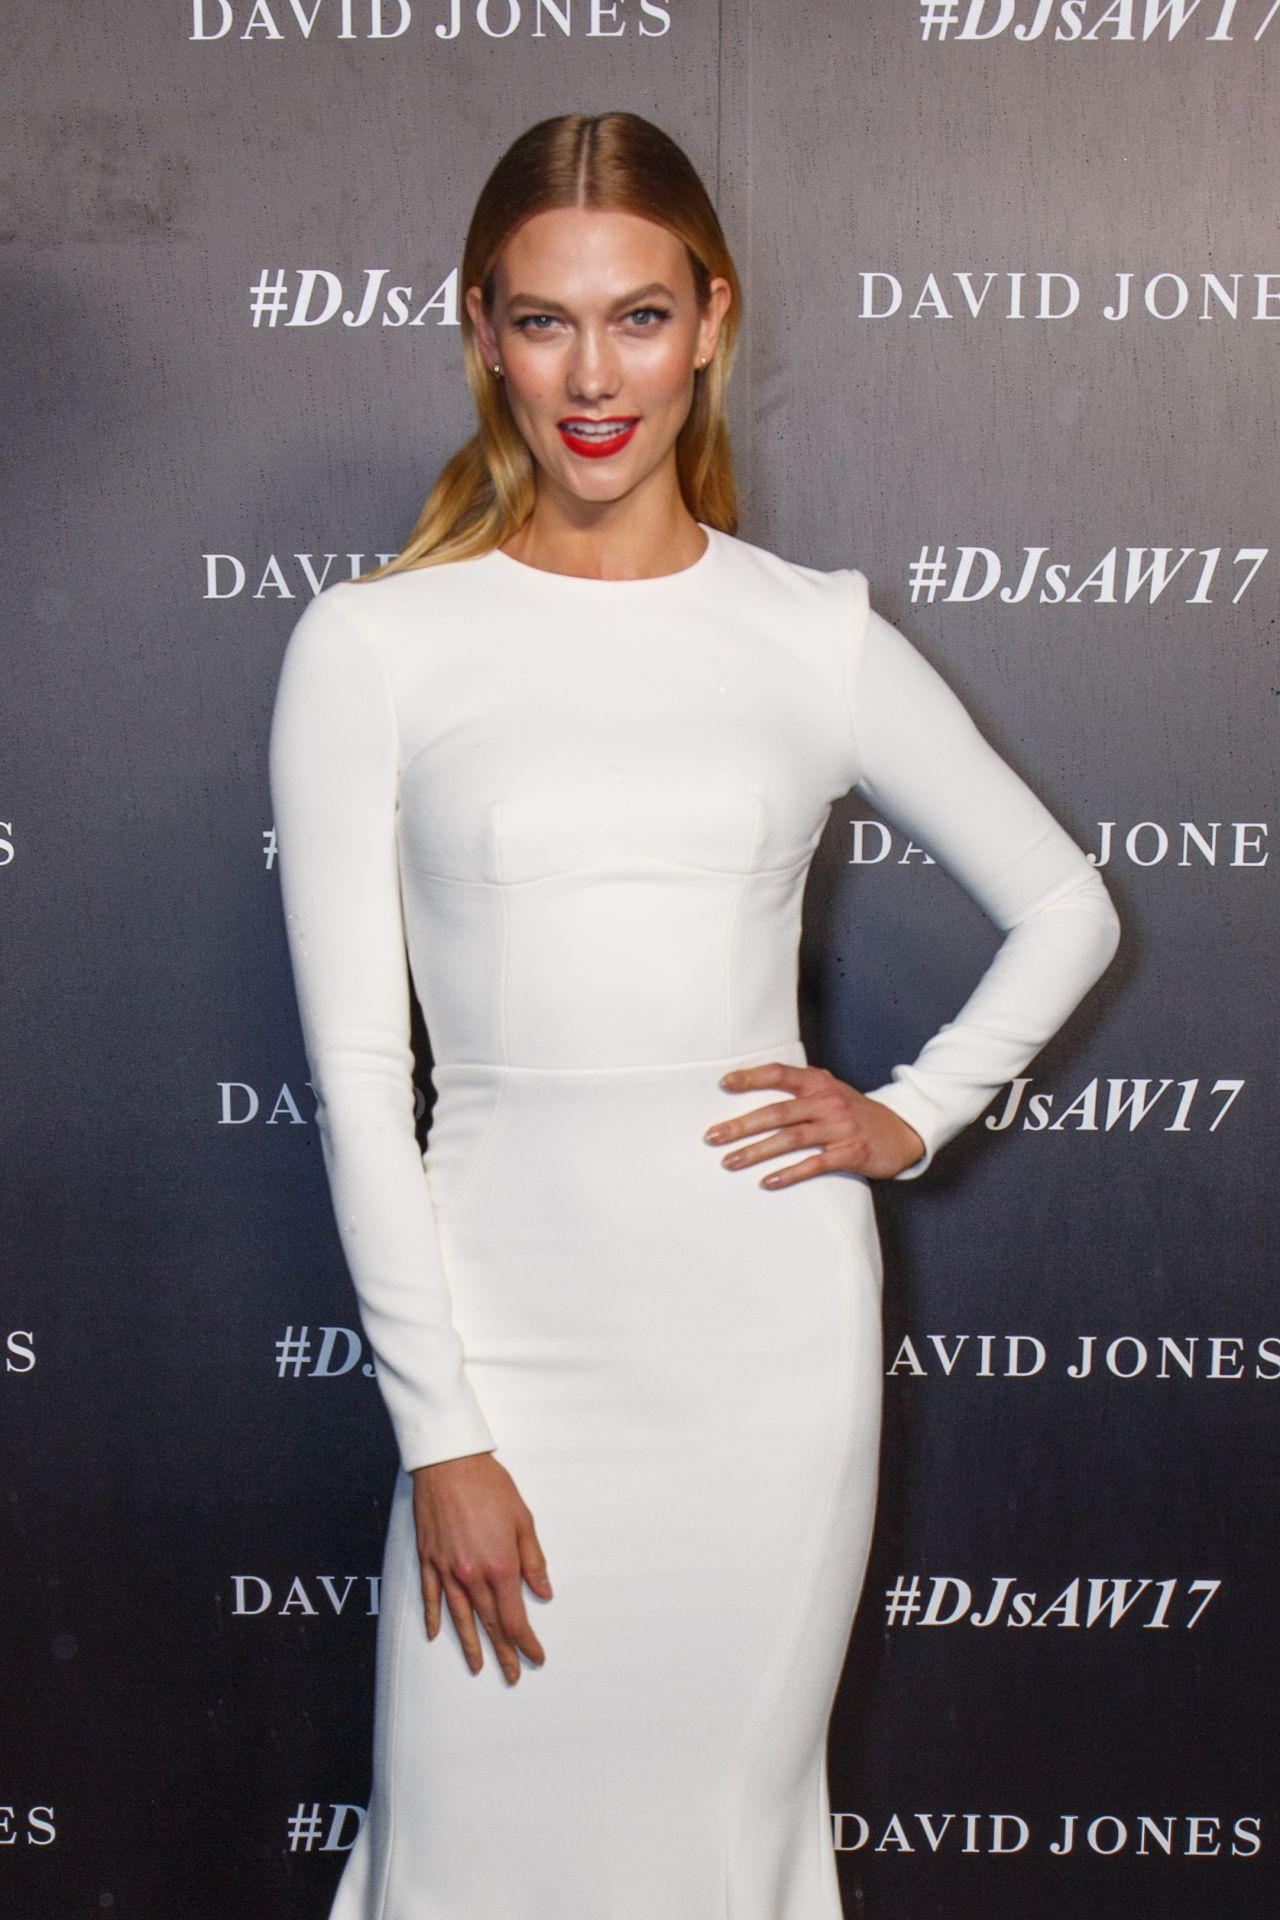 White dress david jones - Karlie Kloss David Jones Autumn Winter 2017 Collections Launch In Sydney 2 1 2017